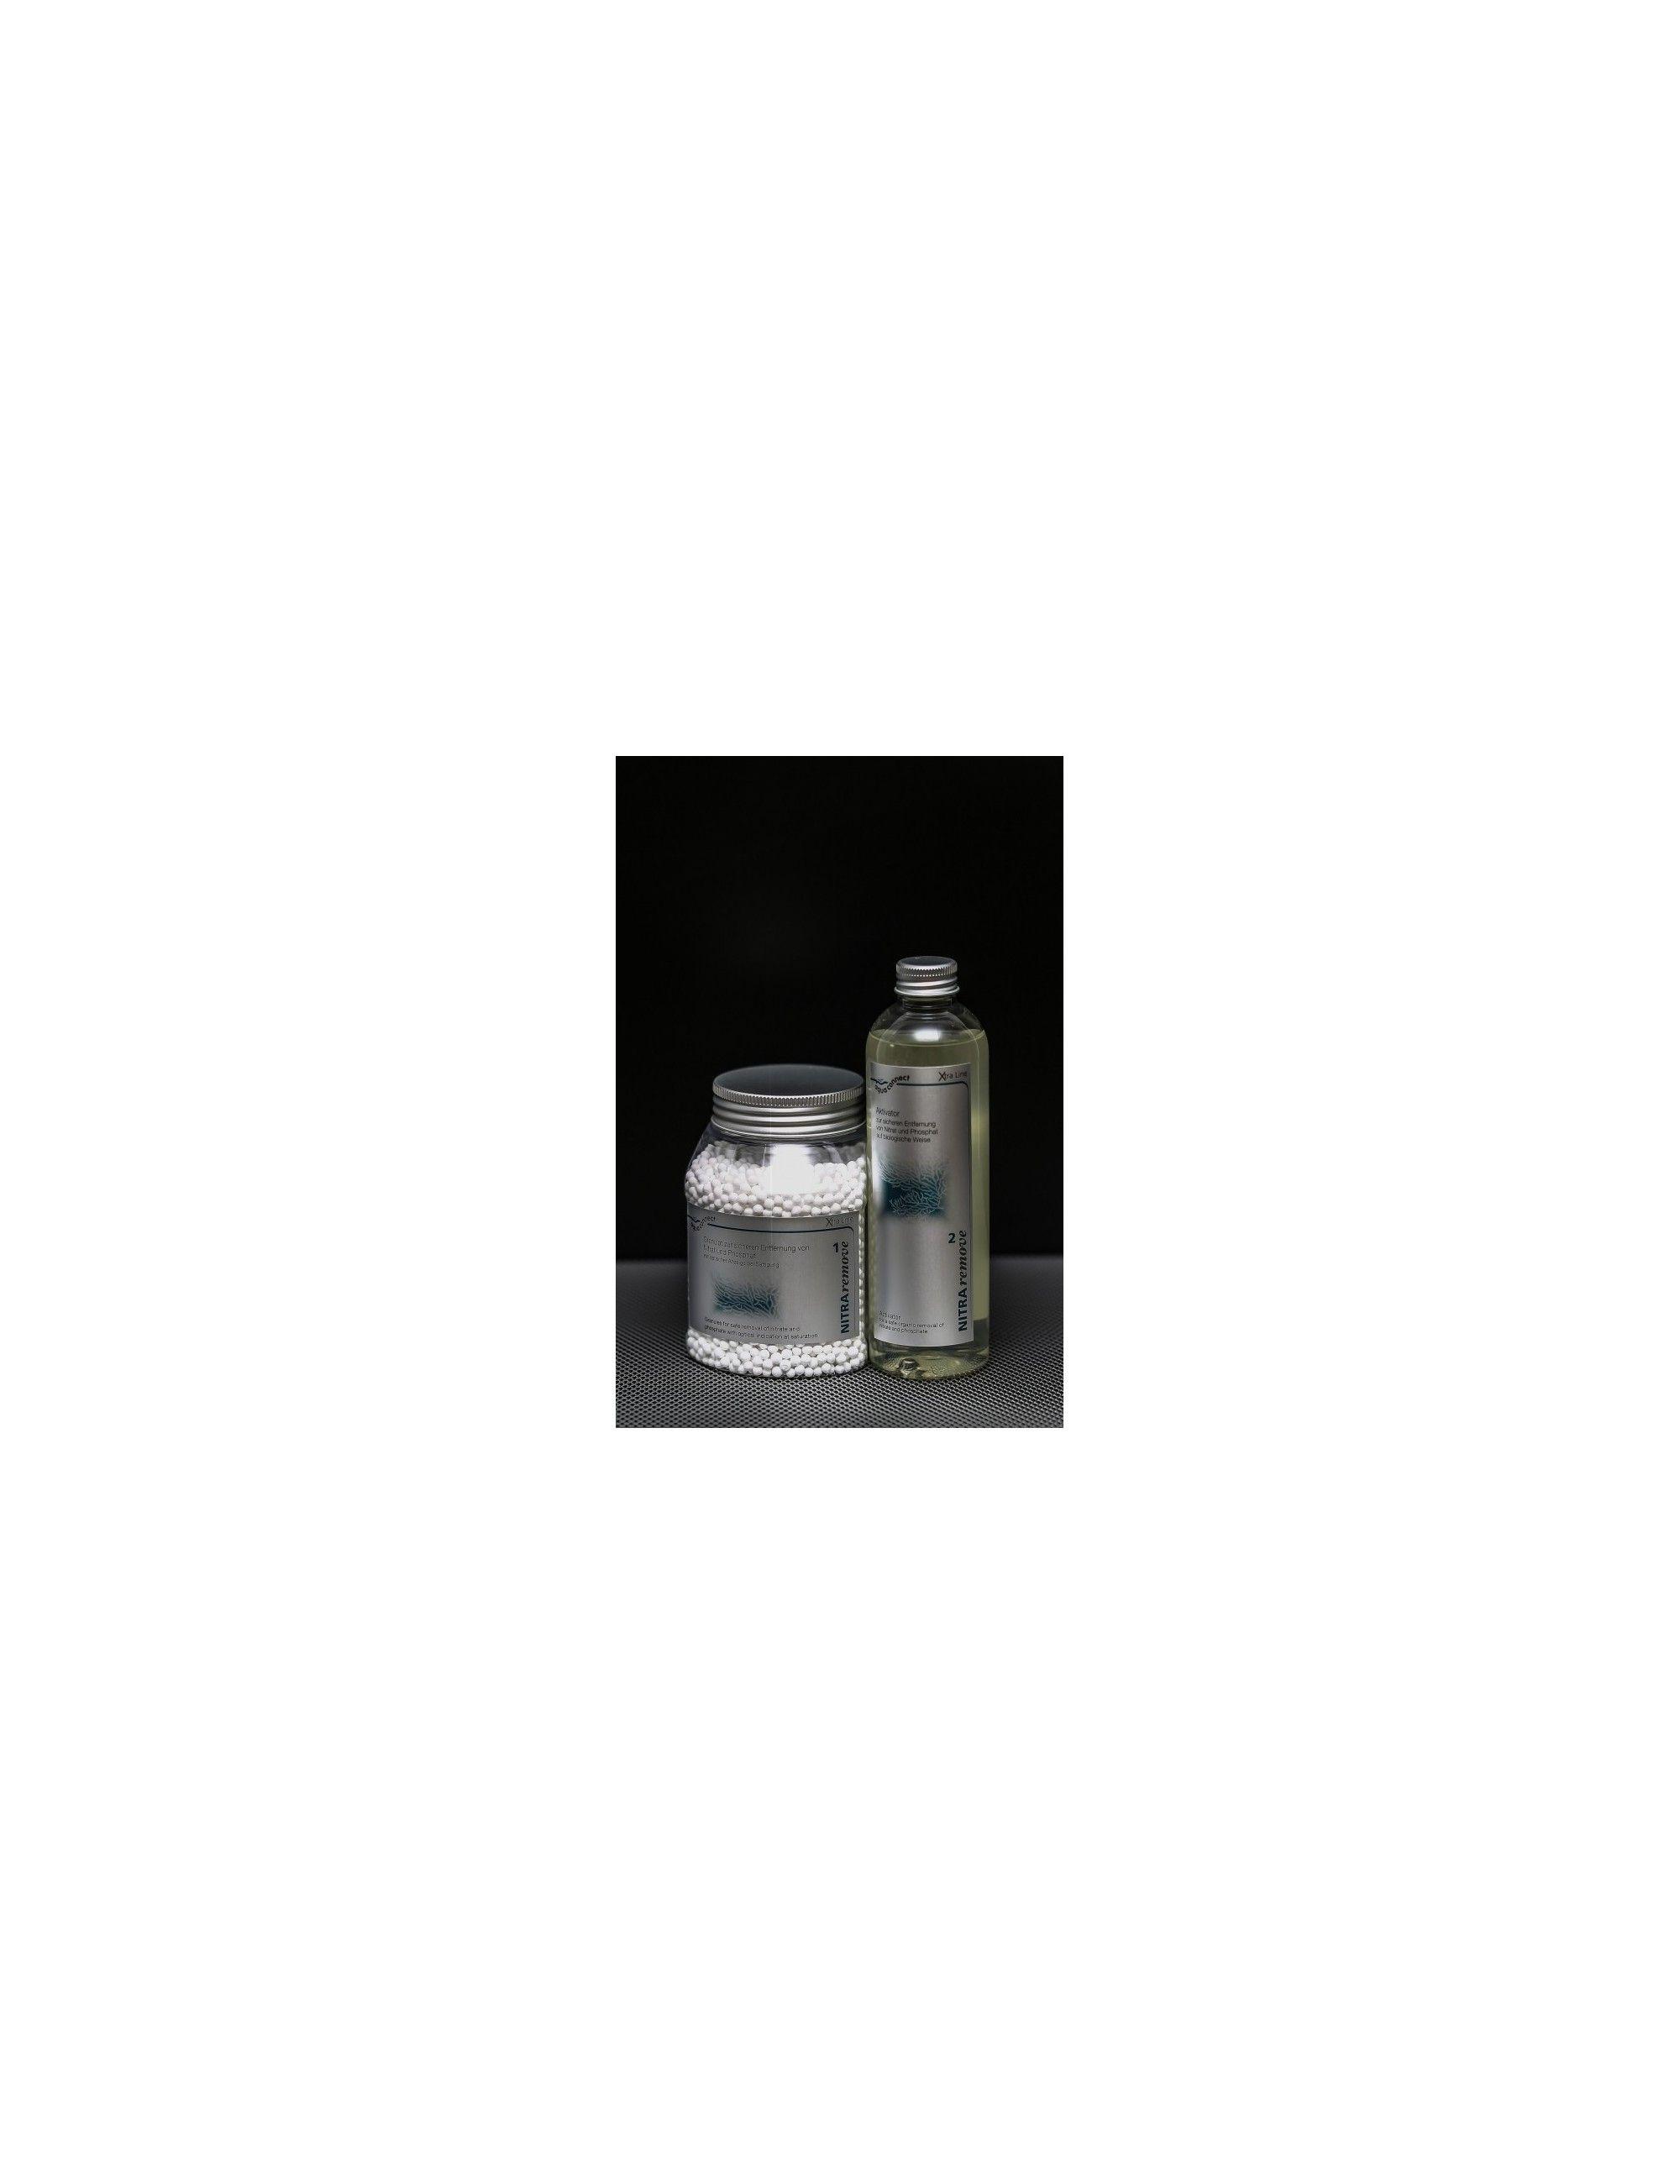 AQUACONNECT NitraRemove 1+2 300g / 250 ml